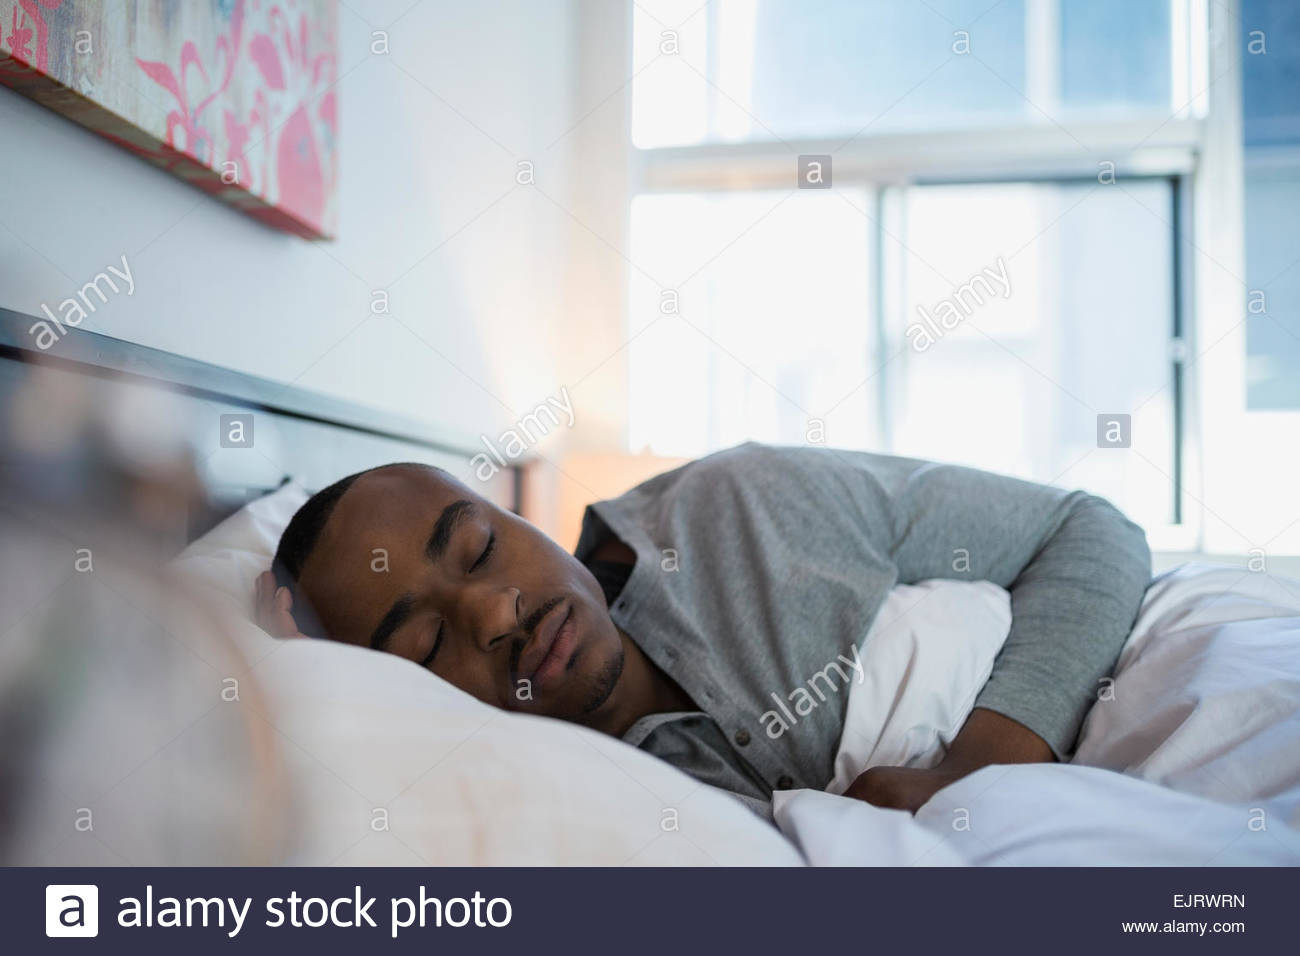 sleeping stockfotos sleeping bilder alamy. Black Bedroom Furniture Sets. Home Design Ideas